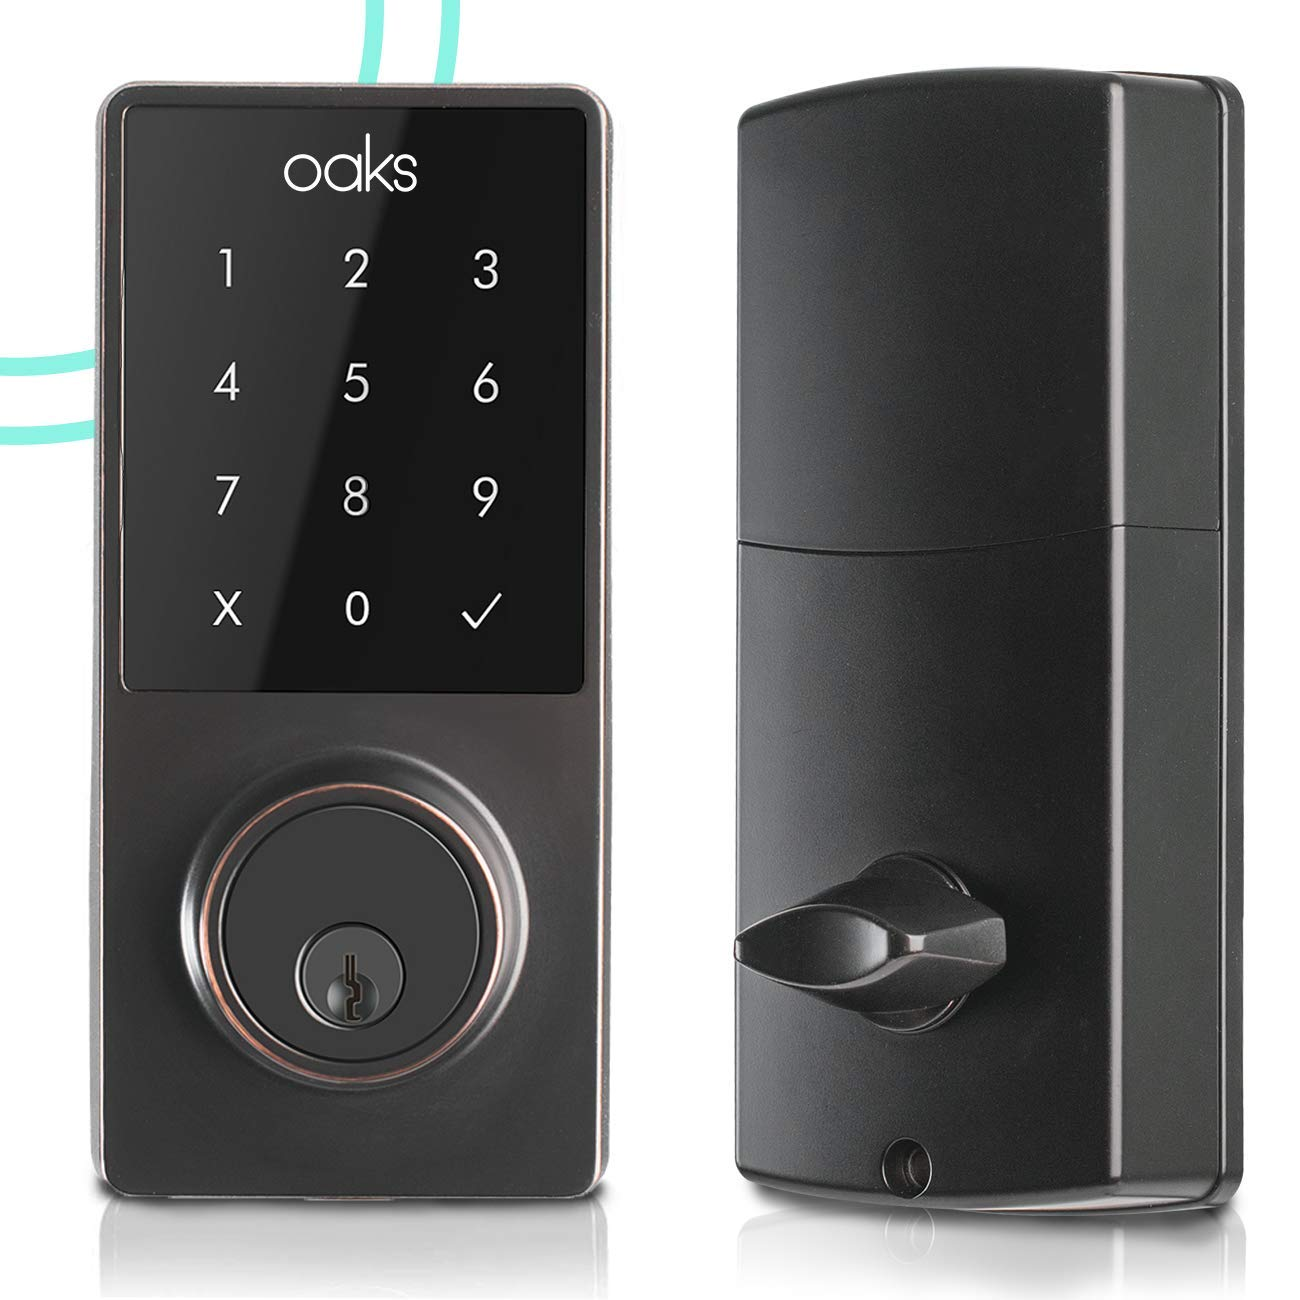 Electronic Deadbolt Smart Door Lock, LED Touch Screen Keypad, Bluetooth Smart Phone Enabled Keyless Access, Easy to Install, Oaks Smart Lock (Smart Lock) by OAKS LABS (Image #1)